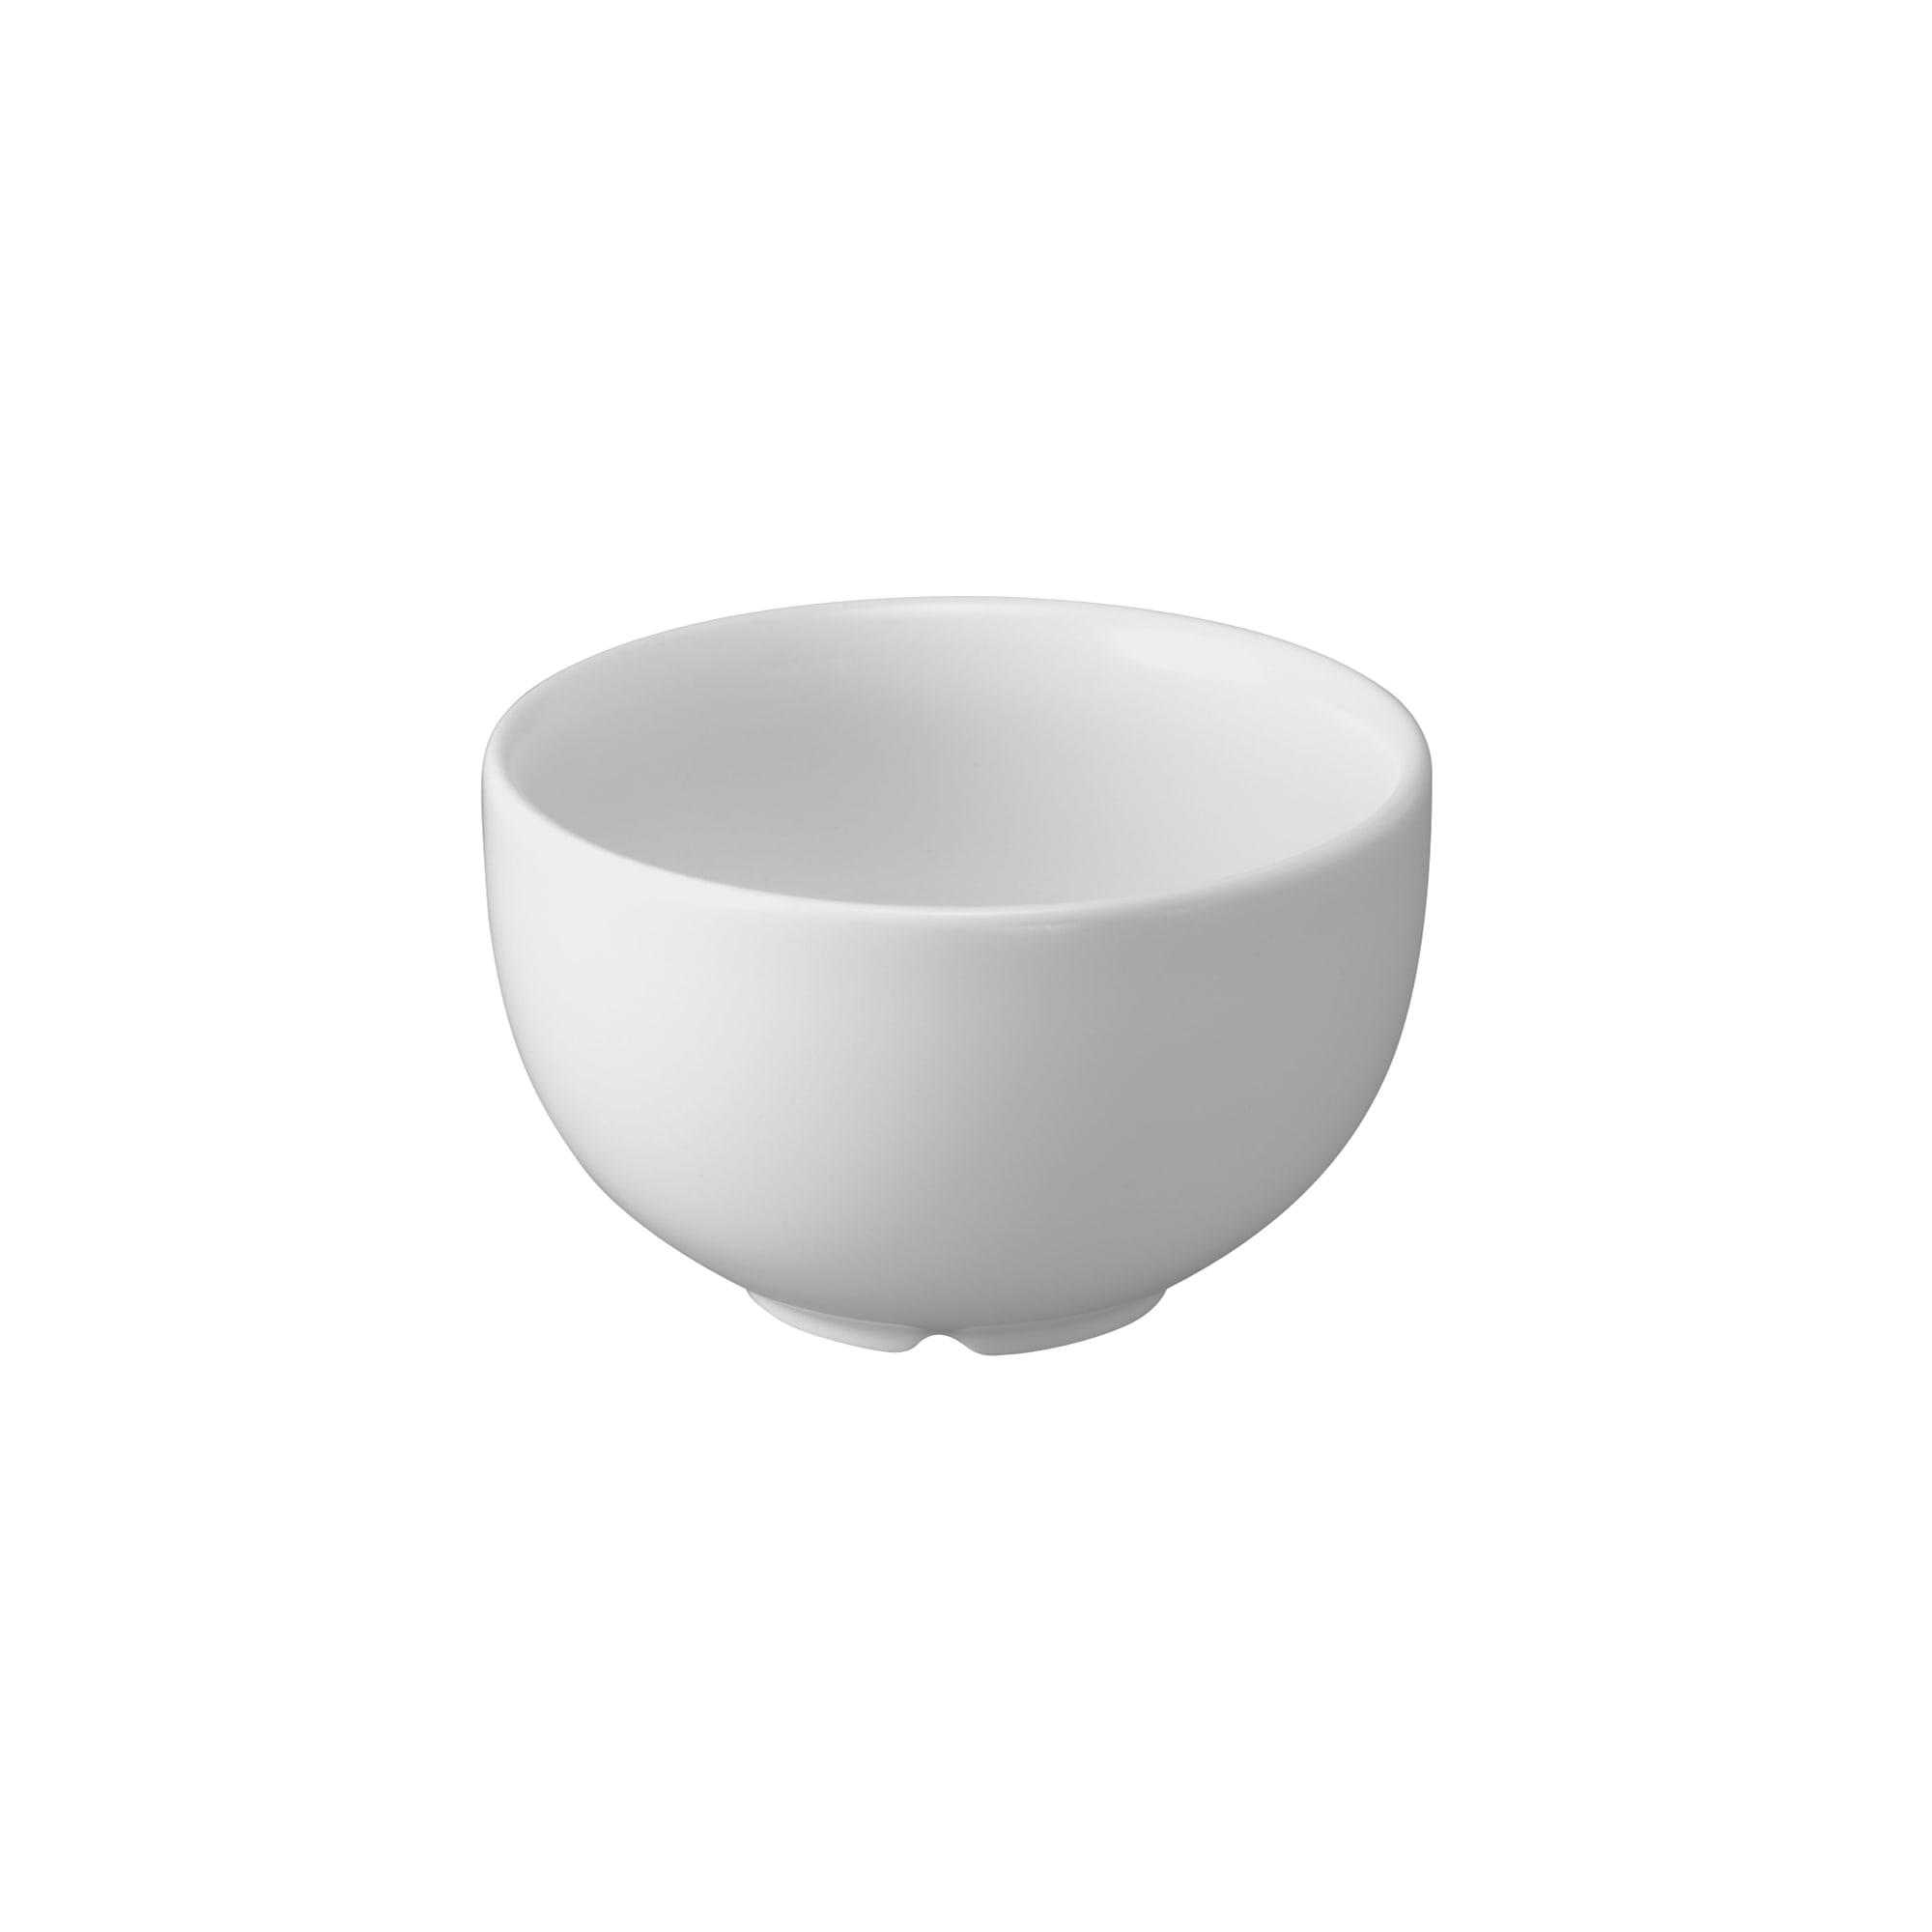 Churchill WHSB1 19 oz Snack Attack Soup Bowl - Ceramic, White